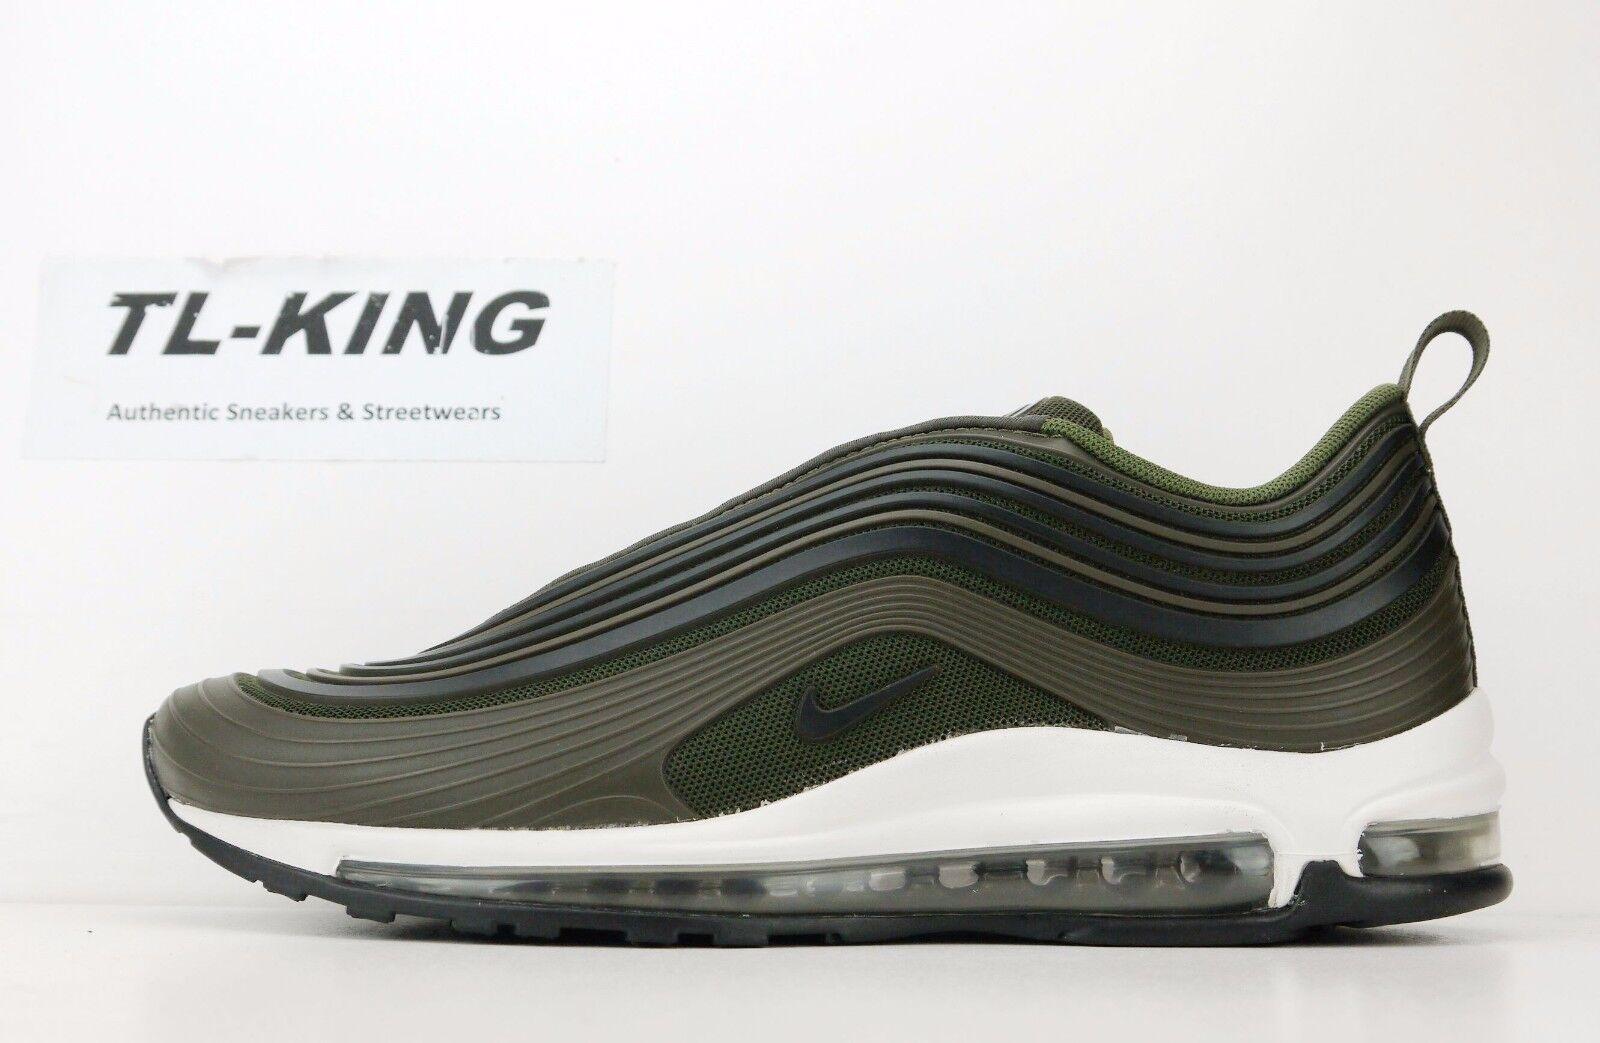 Nike Air Max 97 Ultra '17 Premium Cargo Khaki Black AH7581-300 Msrp  180 CC